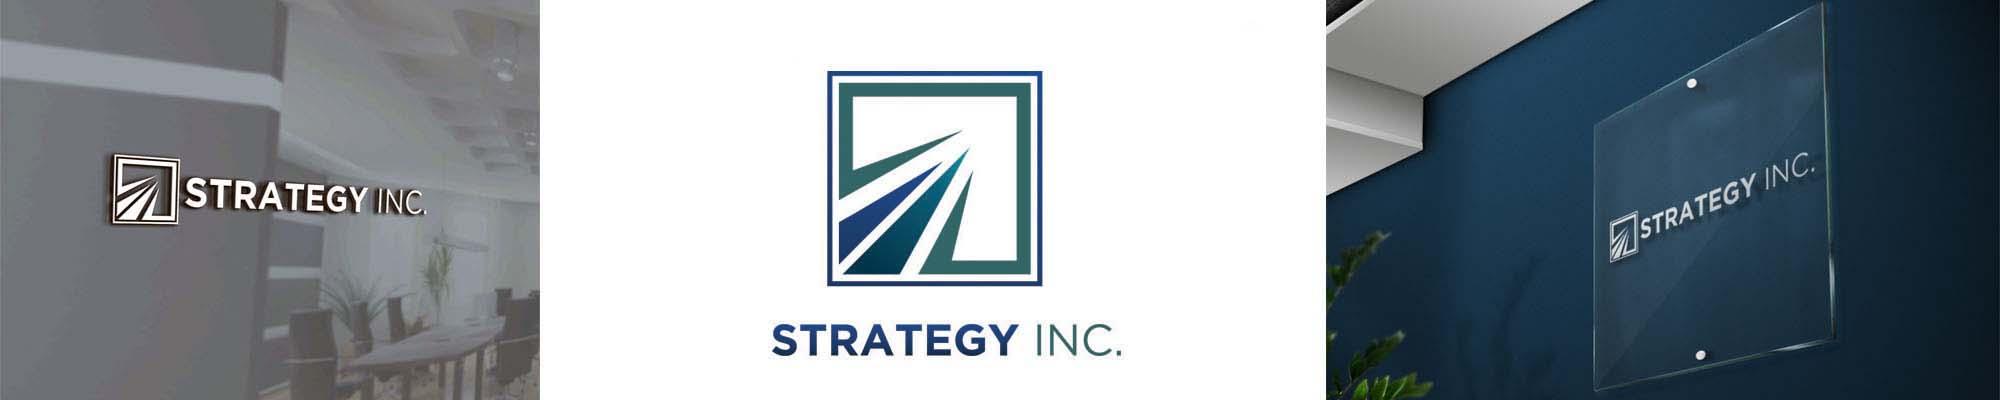 strategy-inc-leadership-representation